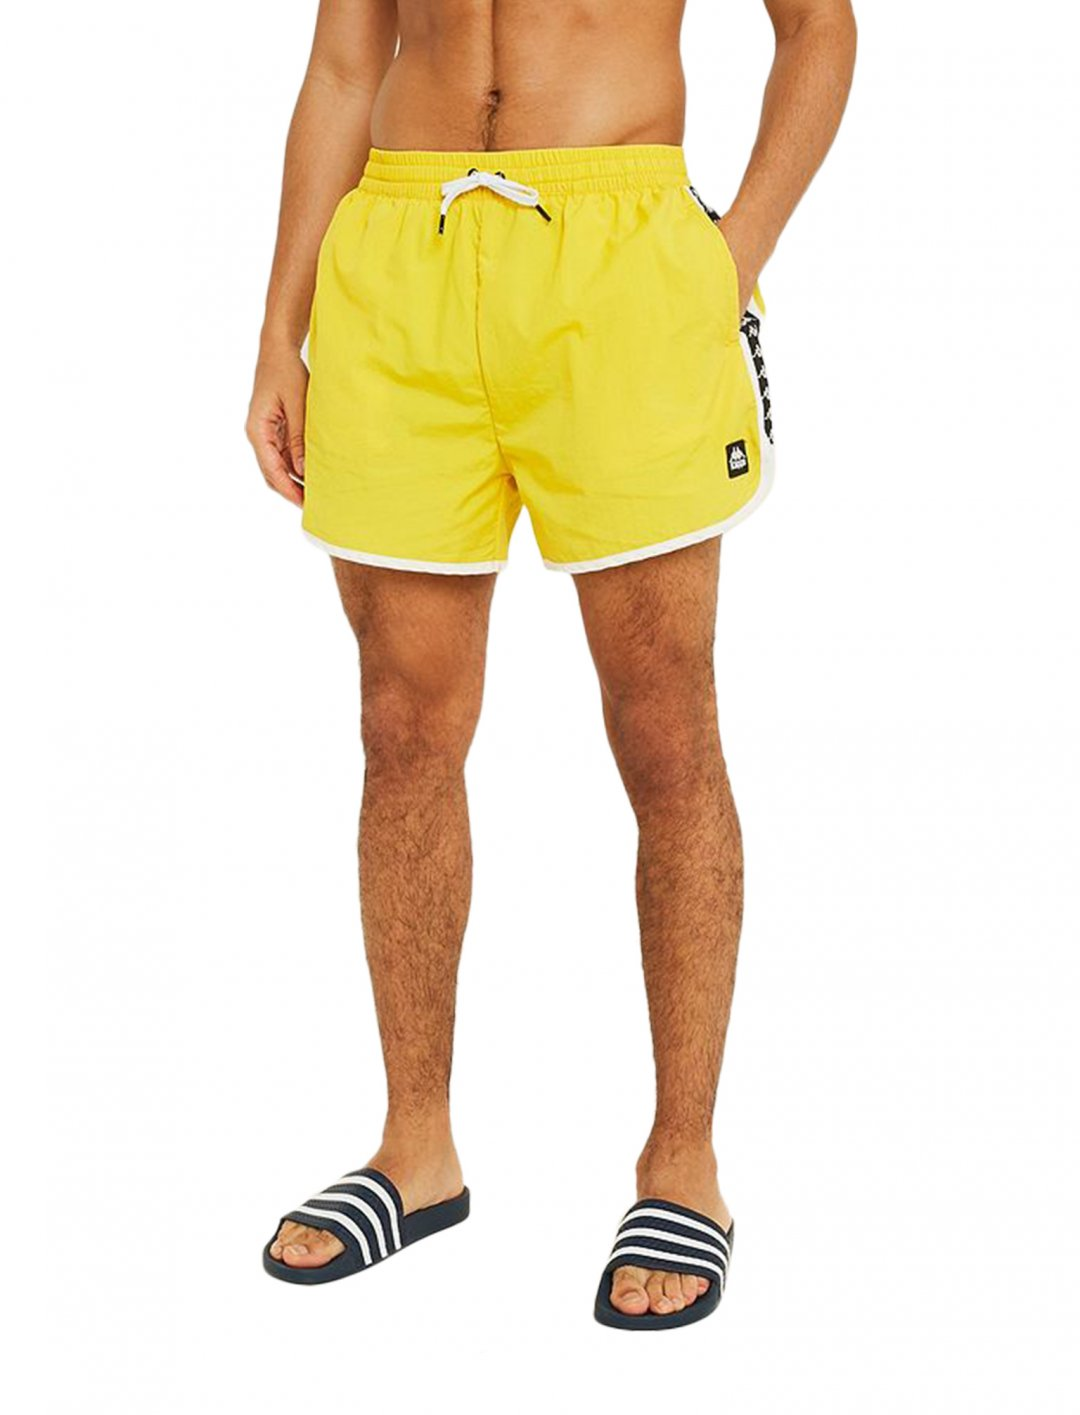 "Kappa Yellow Swim Shorts {""id"":5,""product_section_id"":1,""name"":""Clothing"",""order"":5} Kappa"